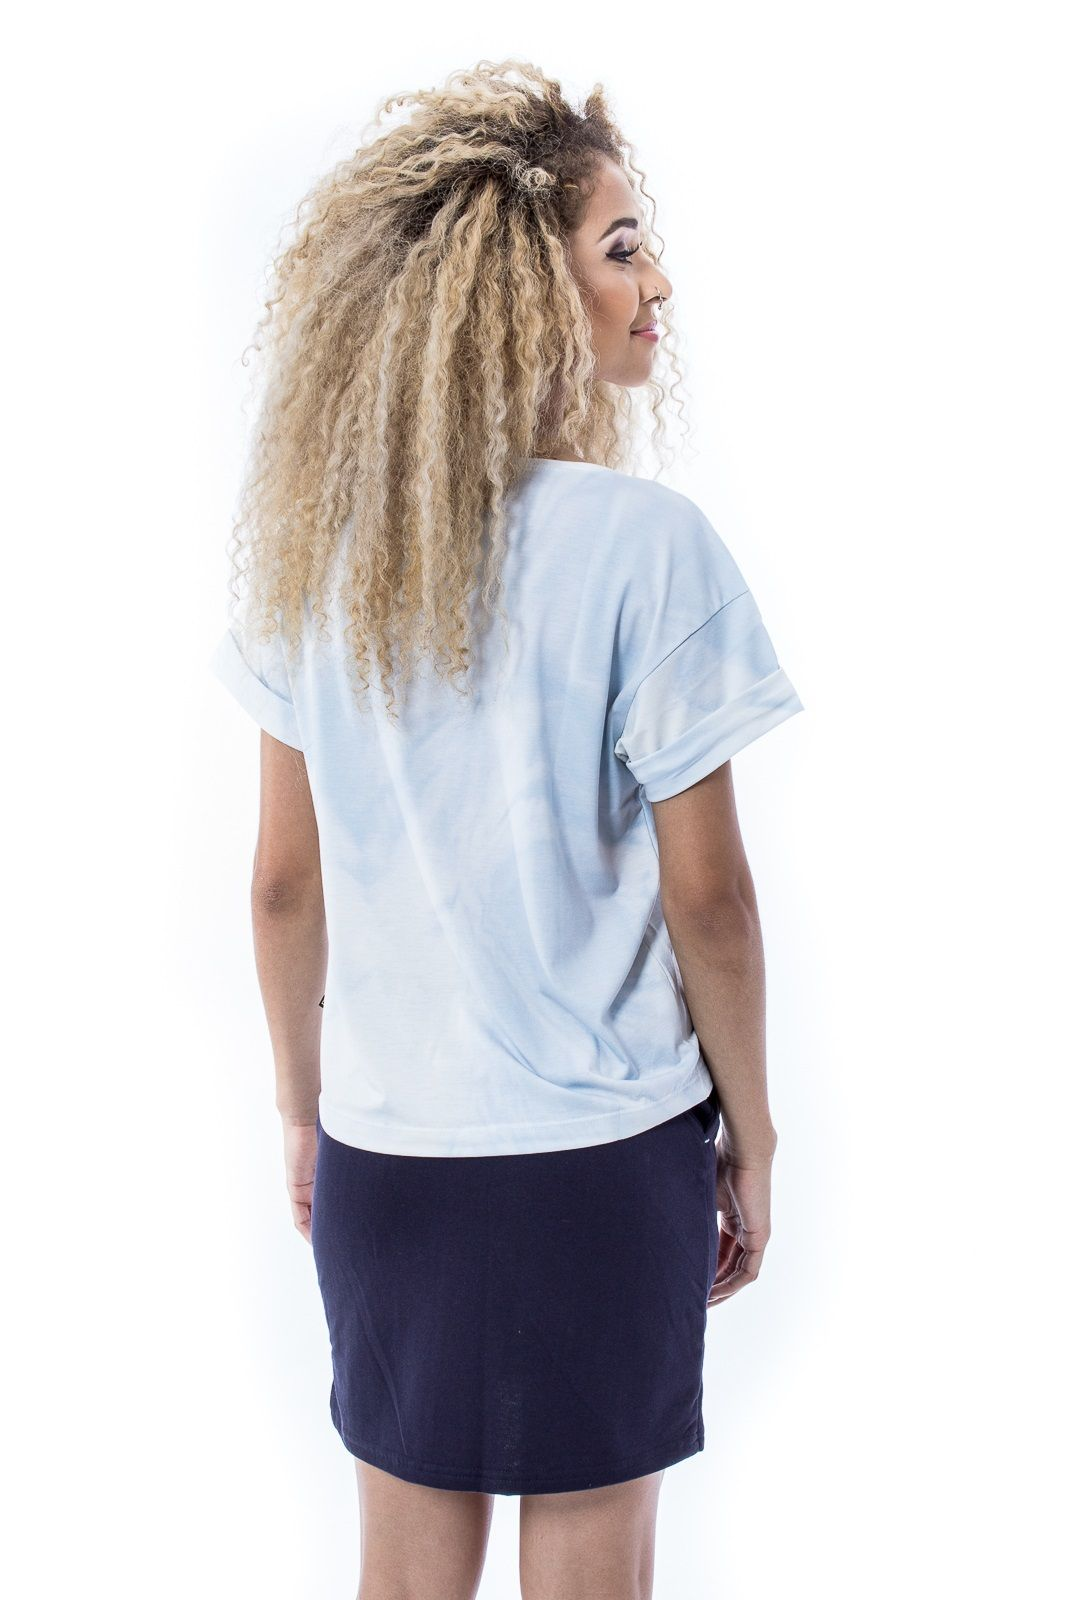 Blusa Básica com bolsinho Tiedye Fullprint Azul Céu